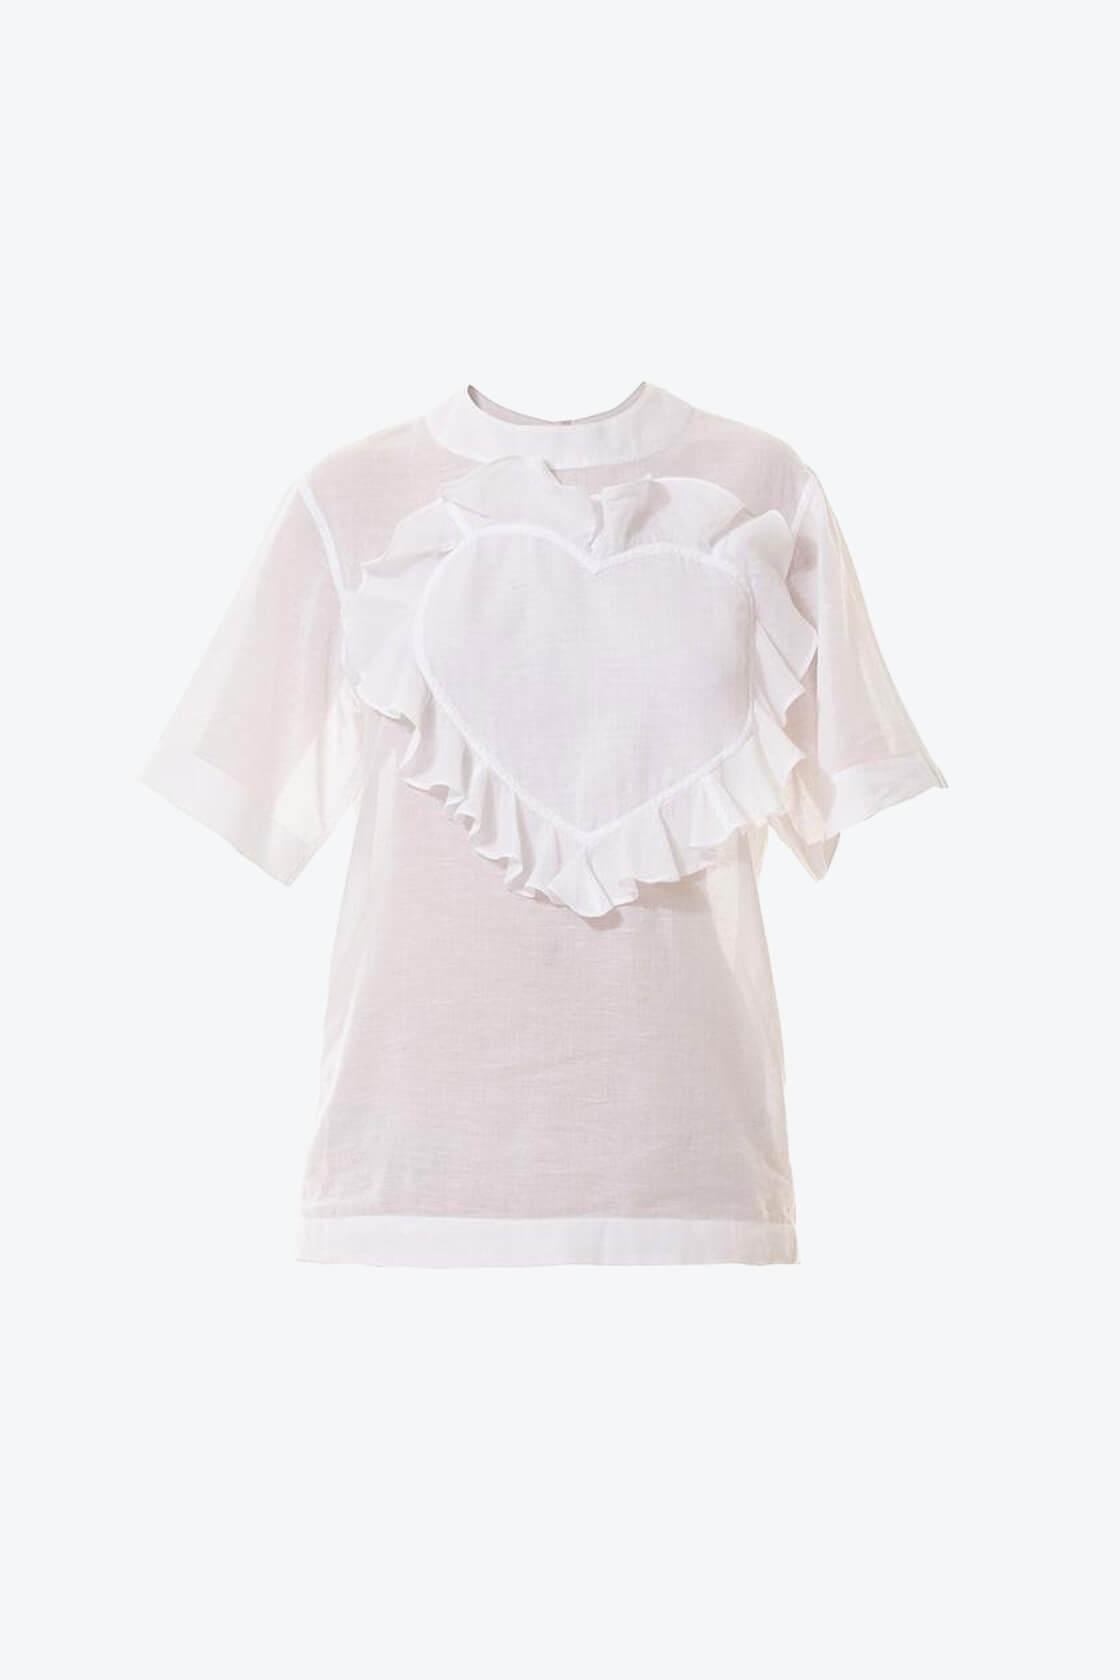 OL10000195 Ruffle heart batista blouse1